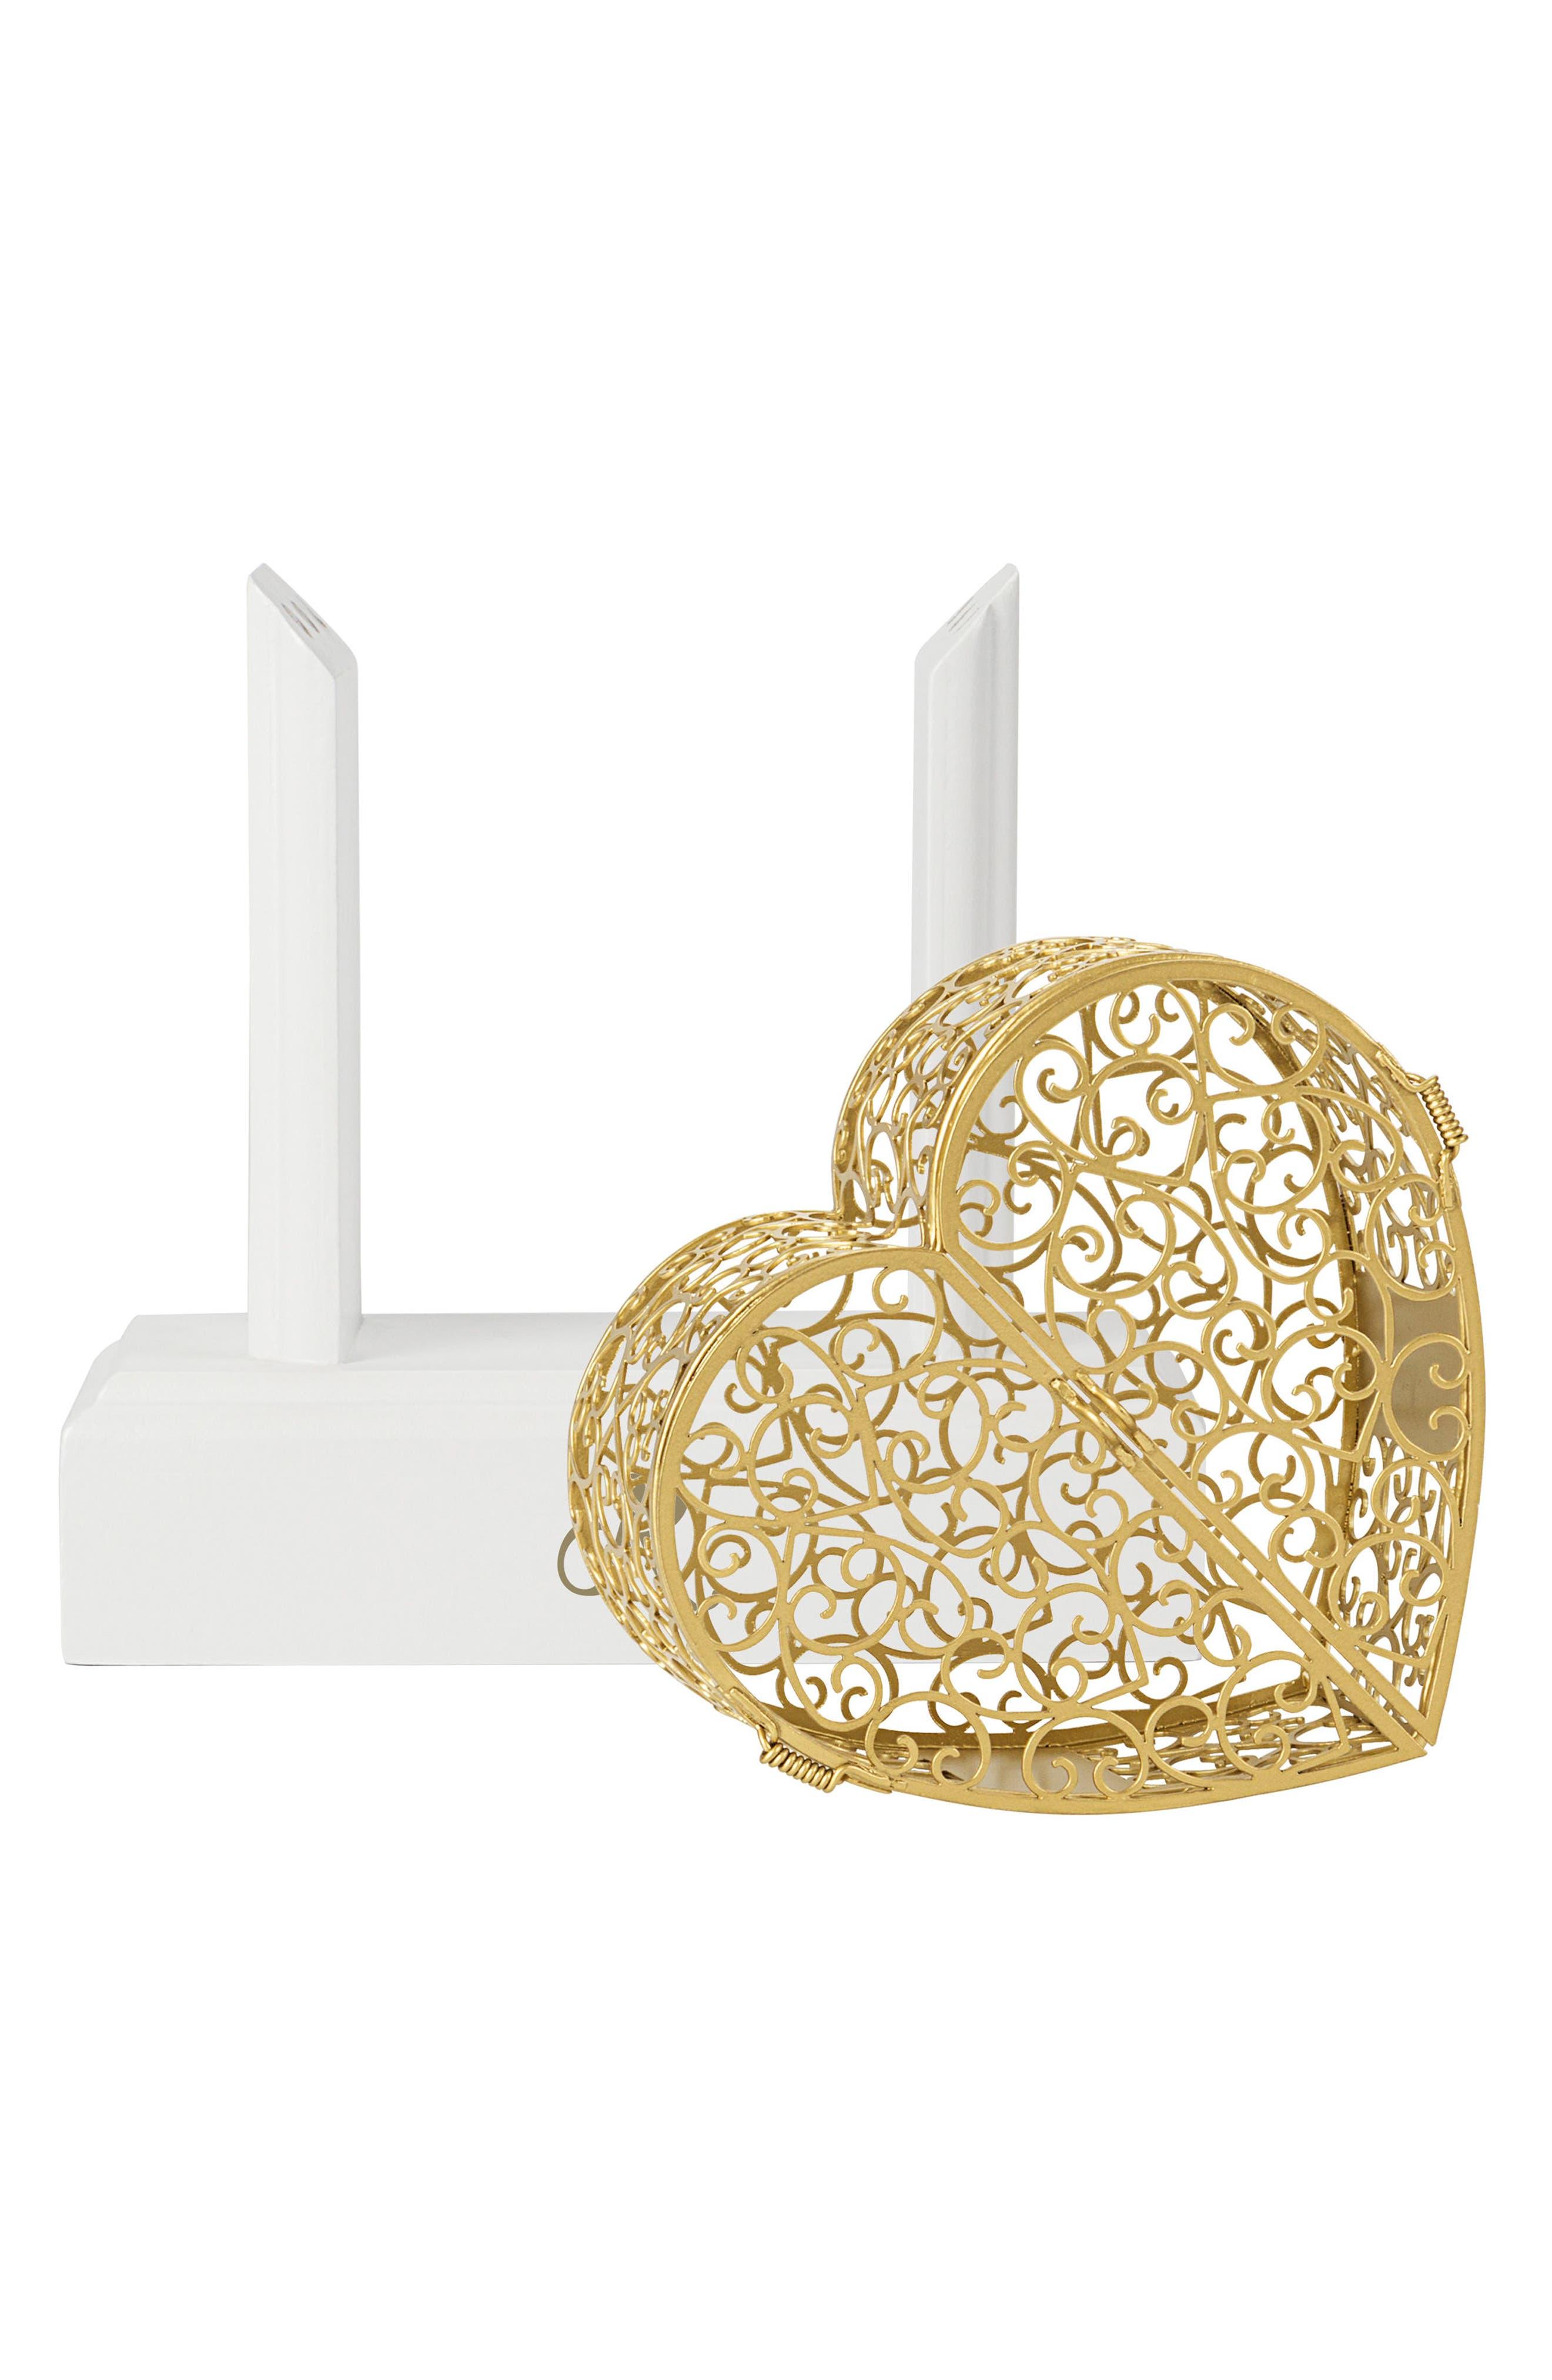 Key To My Heart Monogram Vow Unity Keepsake Box,                             Alternate thumbnail 2, color,                             710